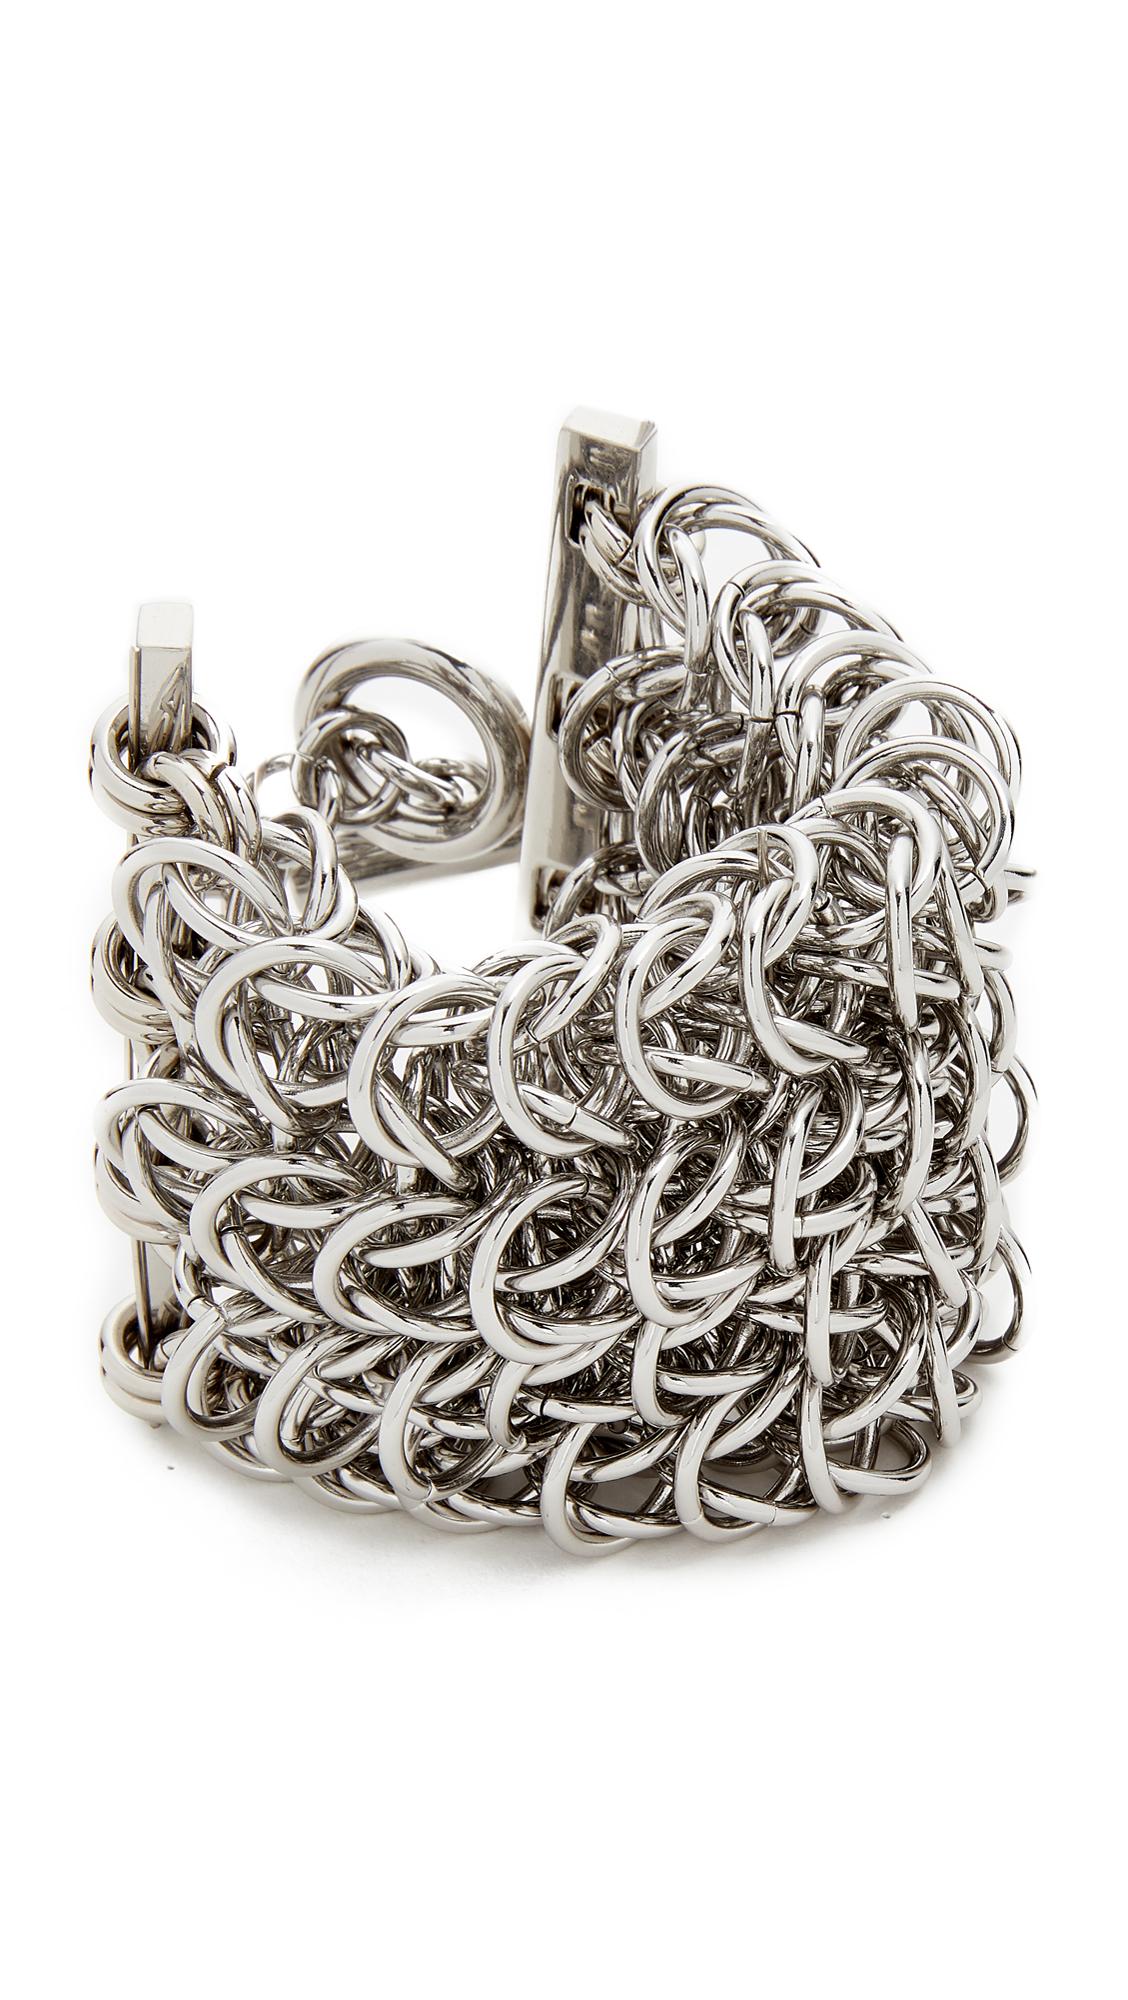 Alexander Wang 4 Row Box Chain Bracelet - Silver